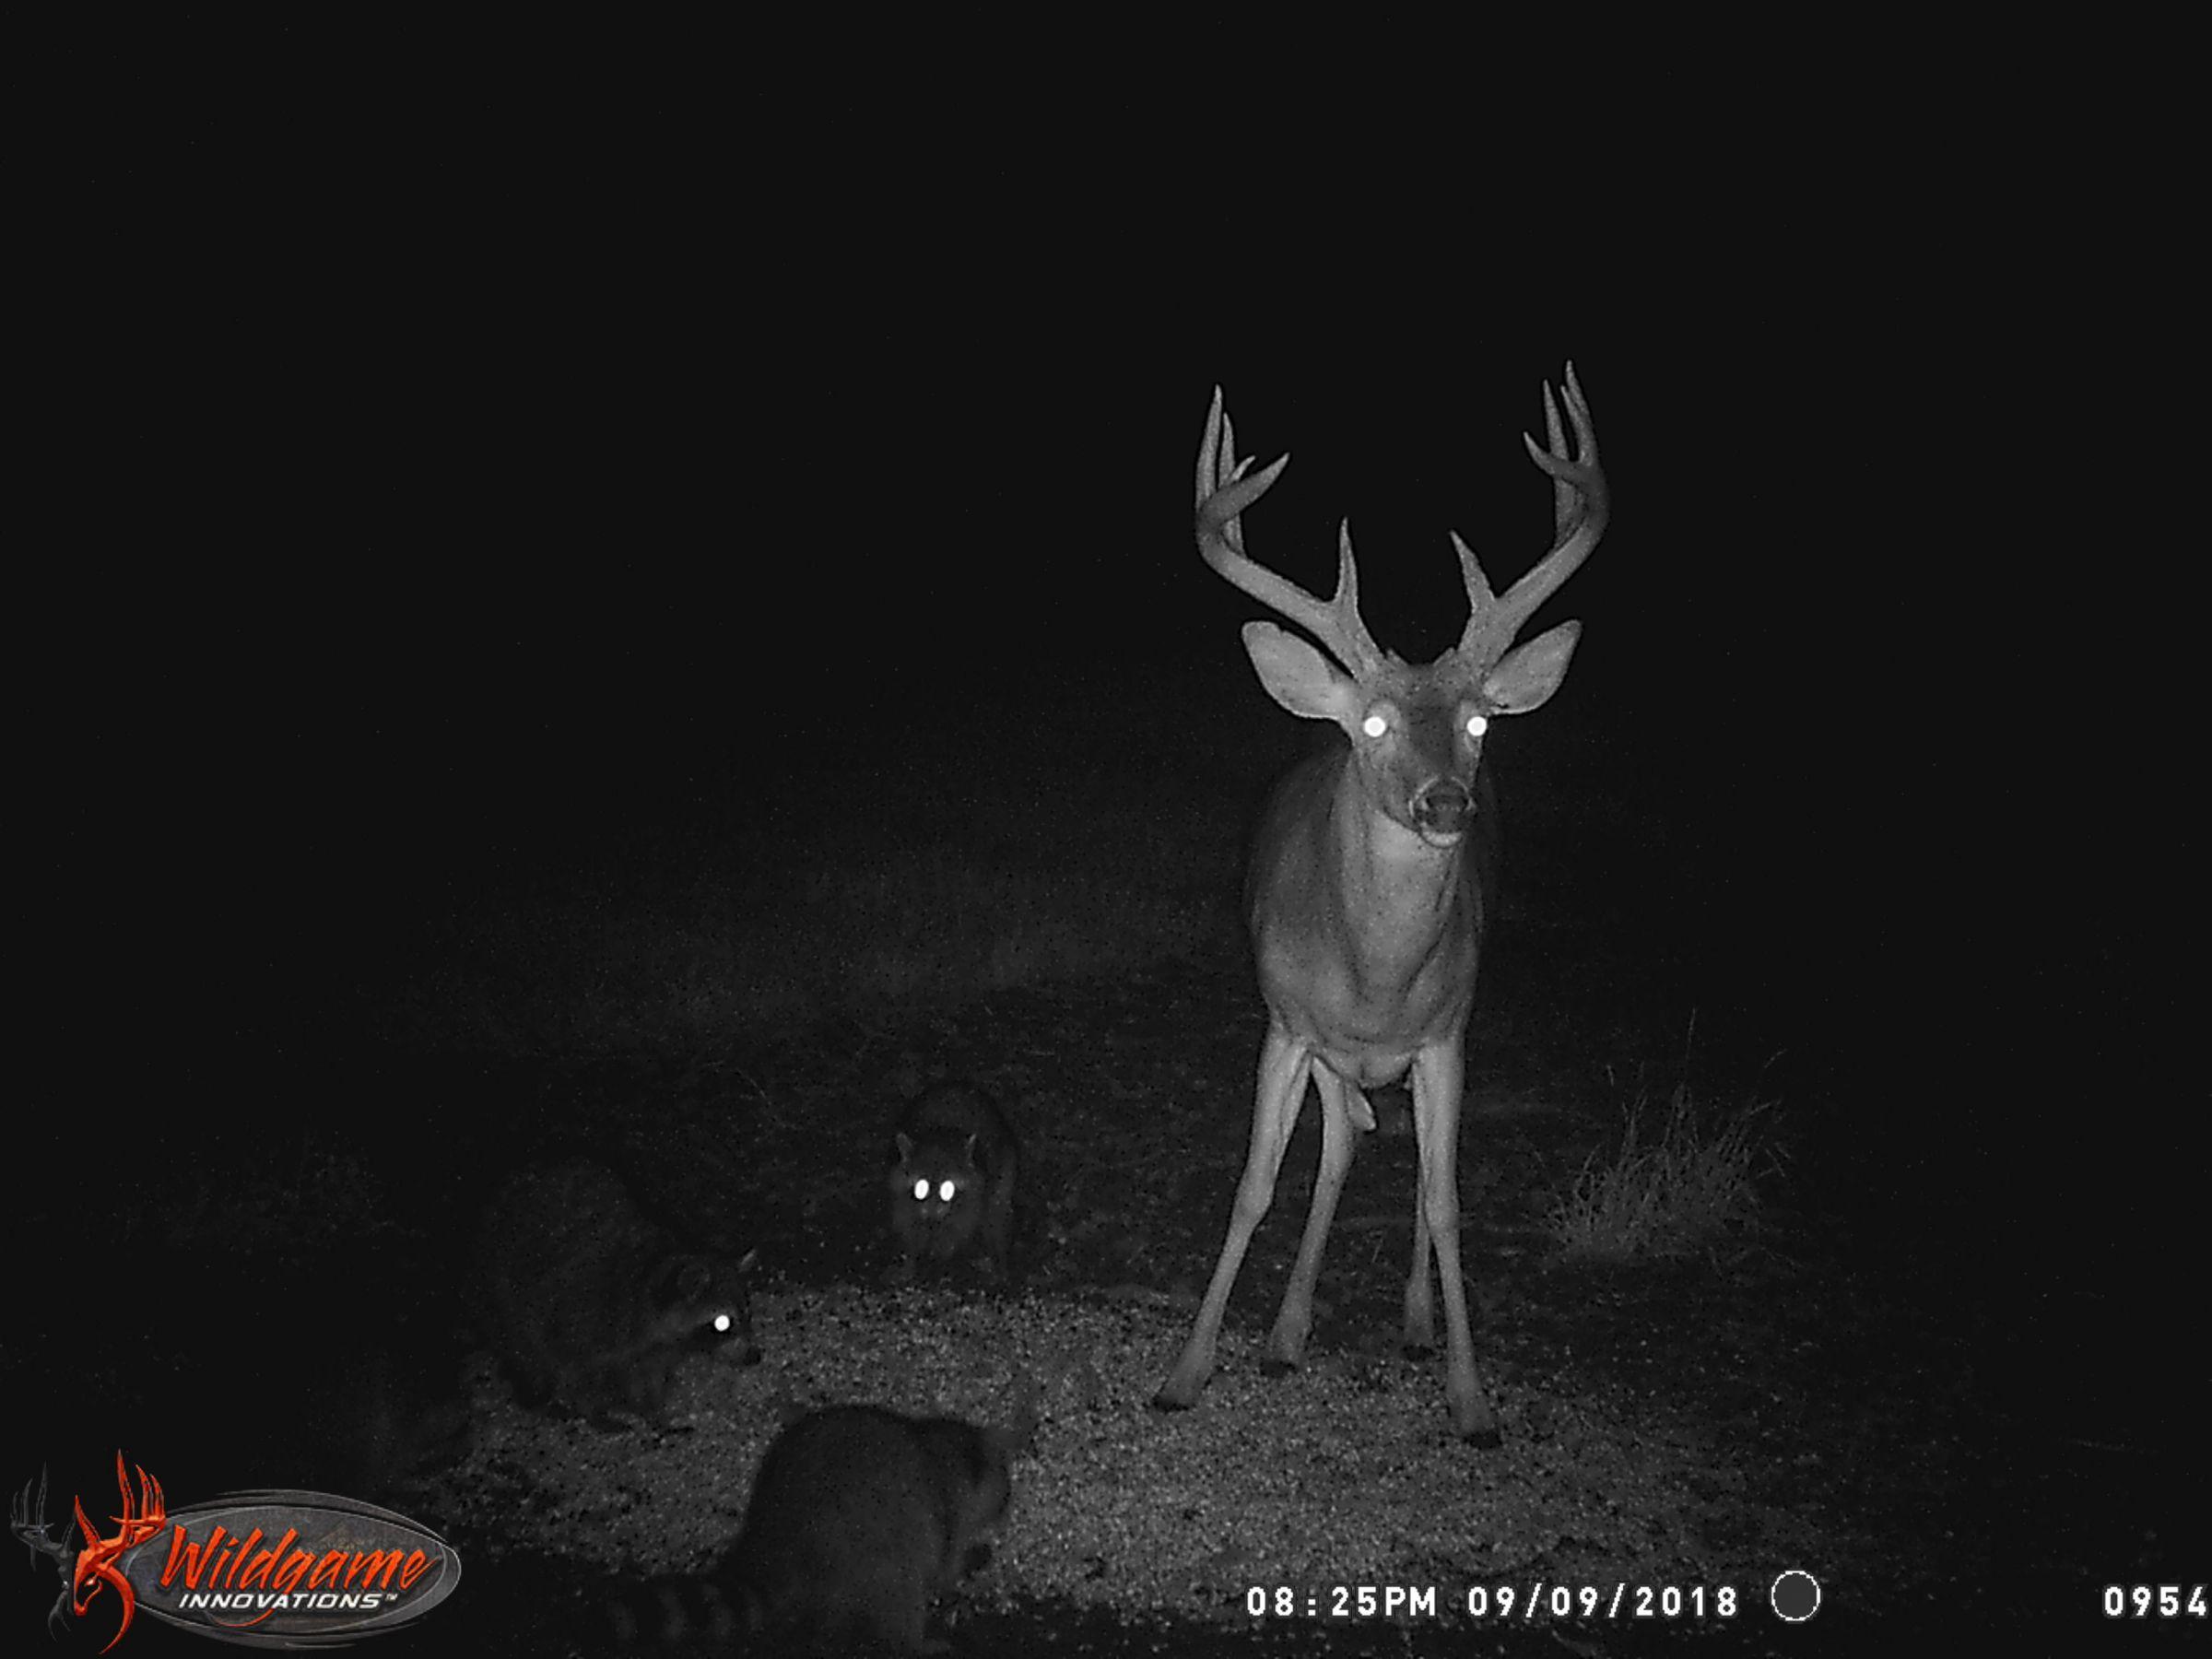 land-clarke-county-iowa-325-acres-listing-number-15416-9-2021-03-19-165618.JPG